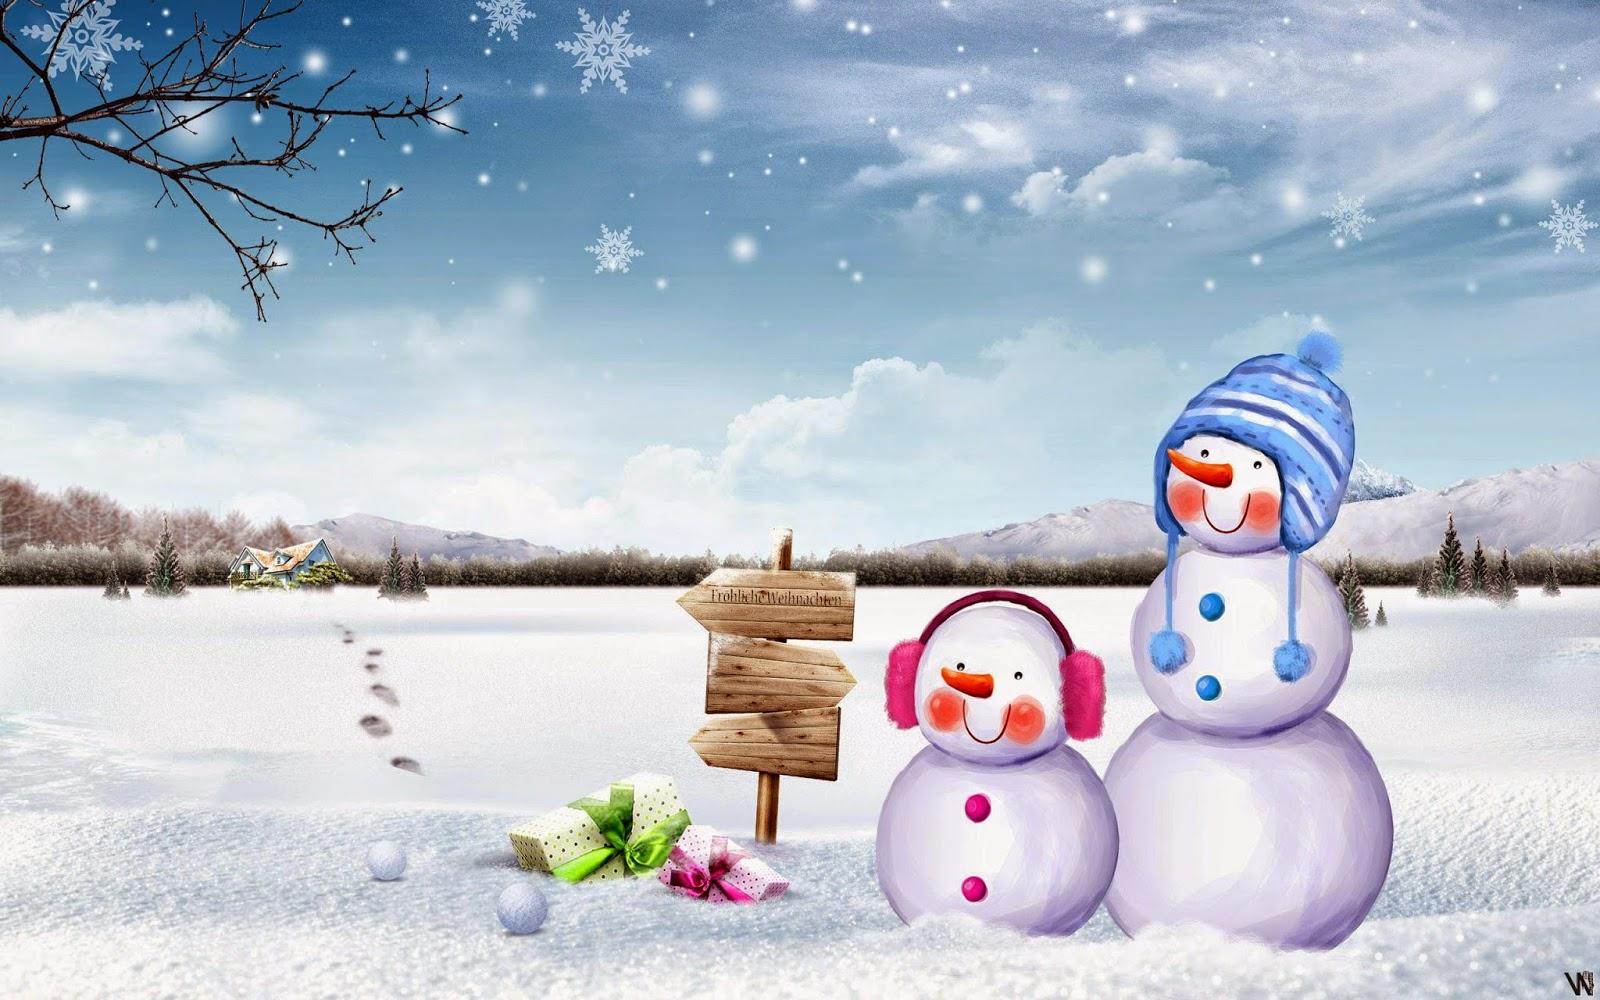 ... little snowman in ice north pole village HD wallpaper free download